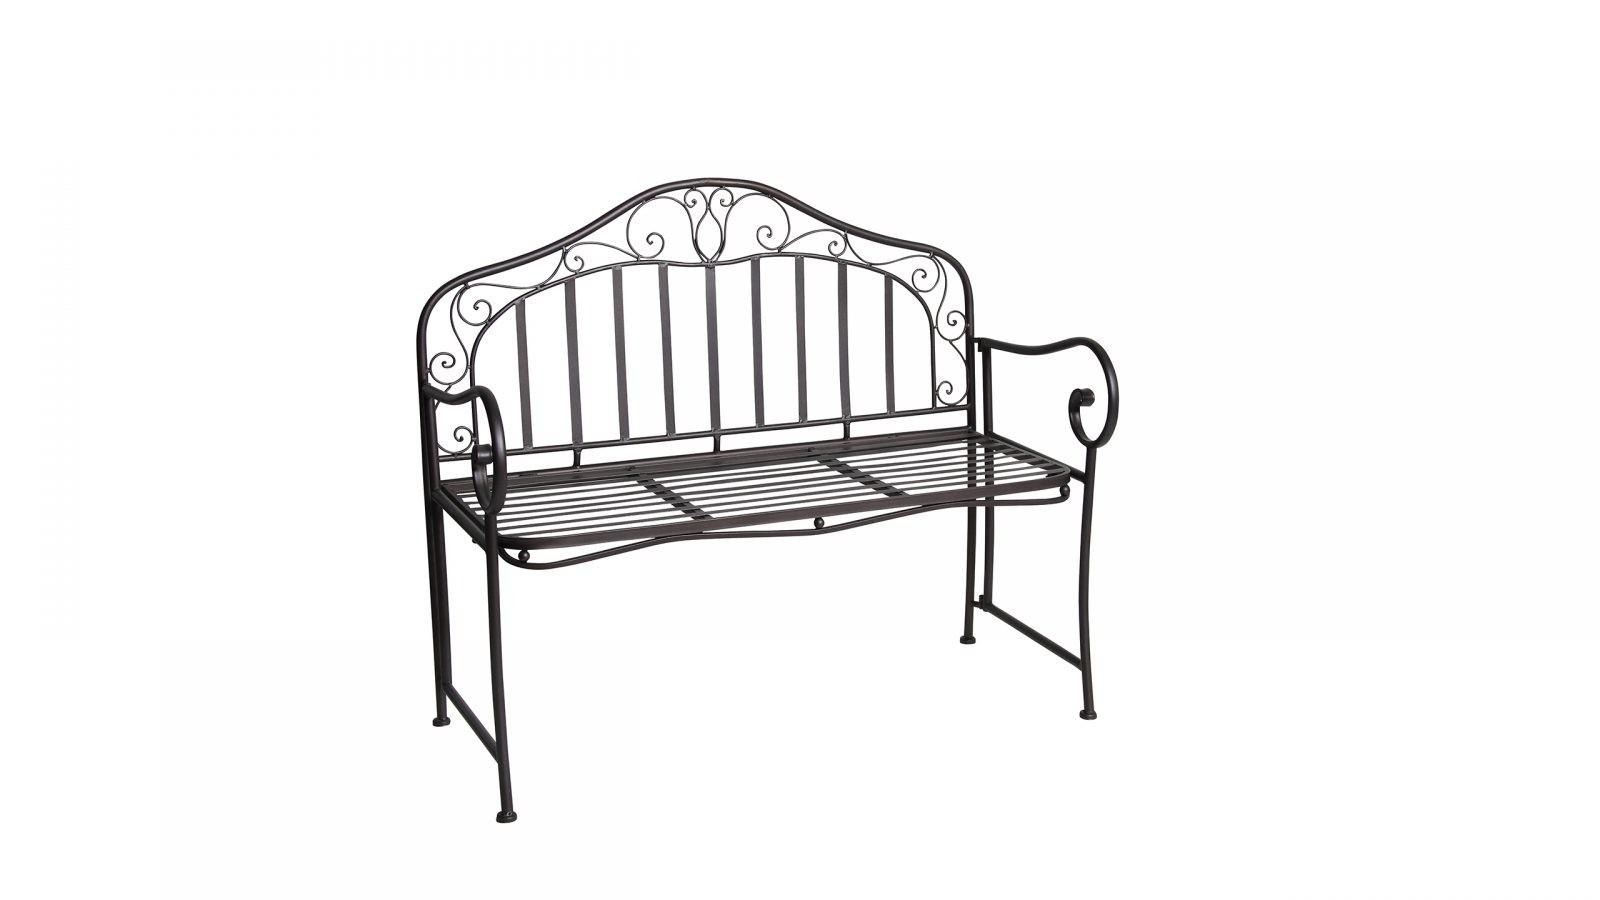 acamp cannes gartenbank acamp. Black Bedroom Furniture Sets. Home Design Ideas